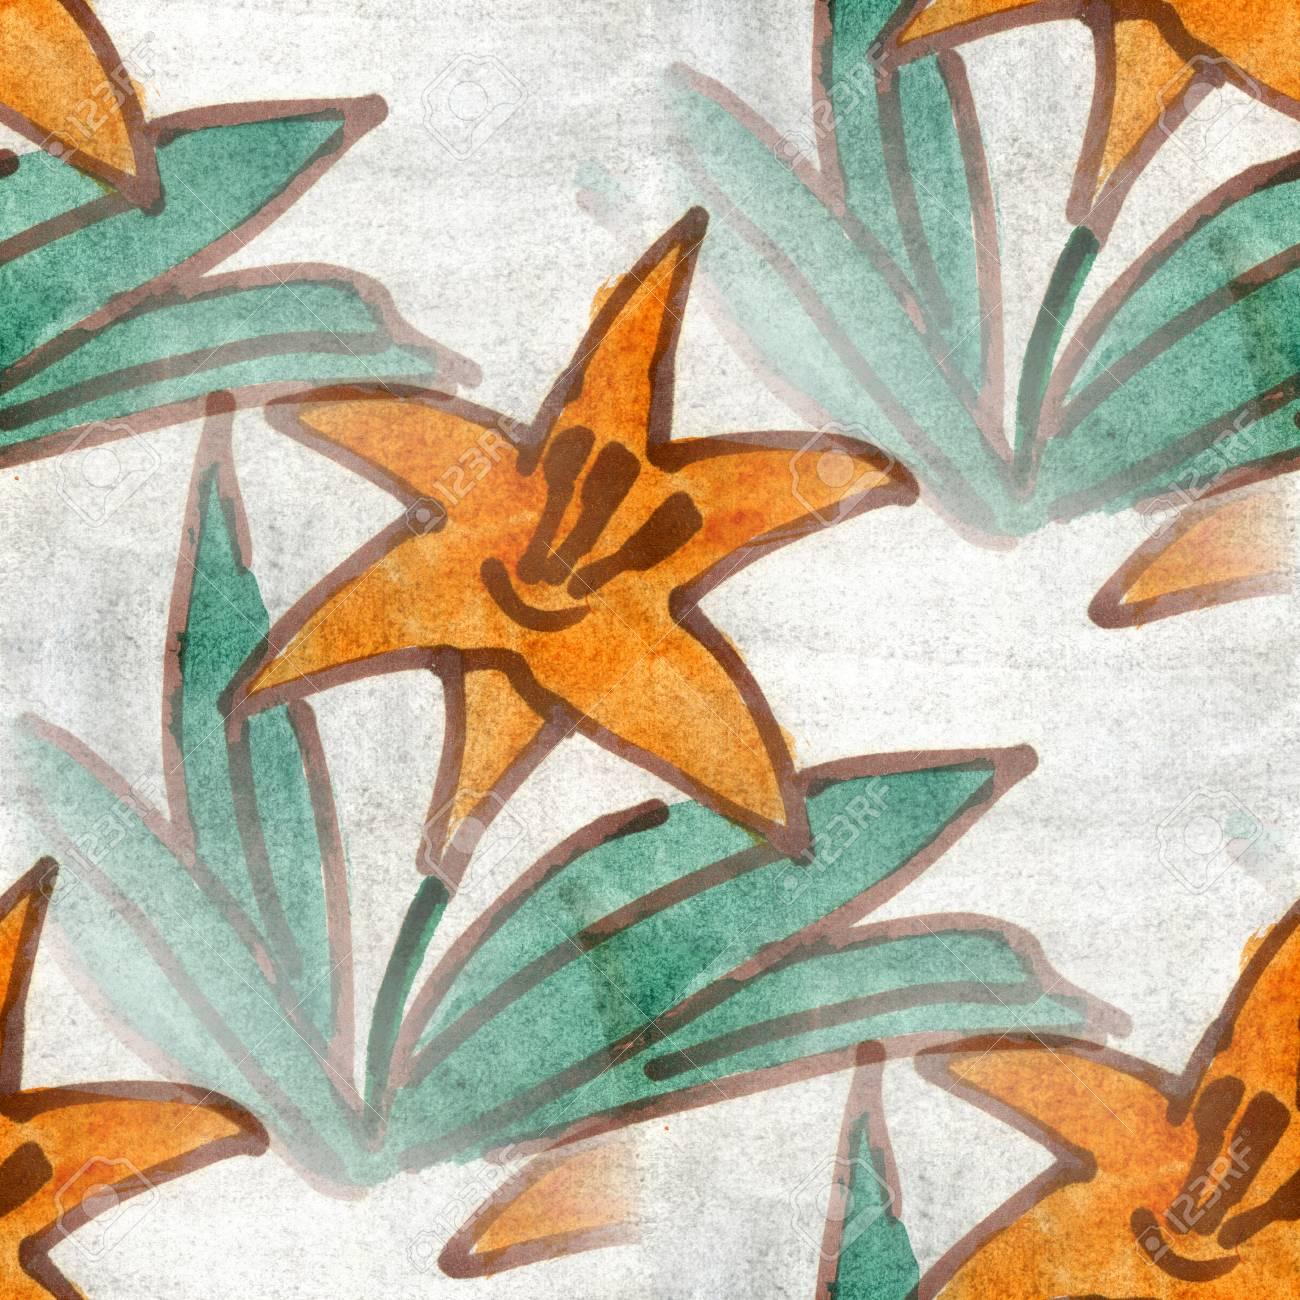 Fleurs Seamless Vert Orange Fond Snowdrop Main Papier Peint